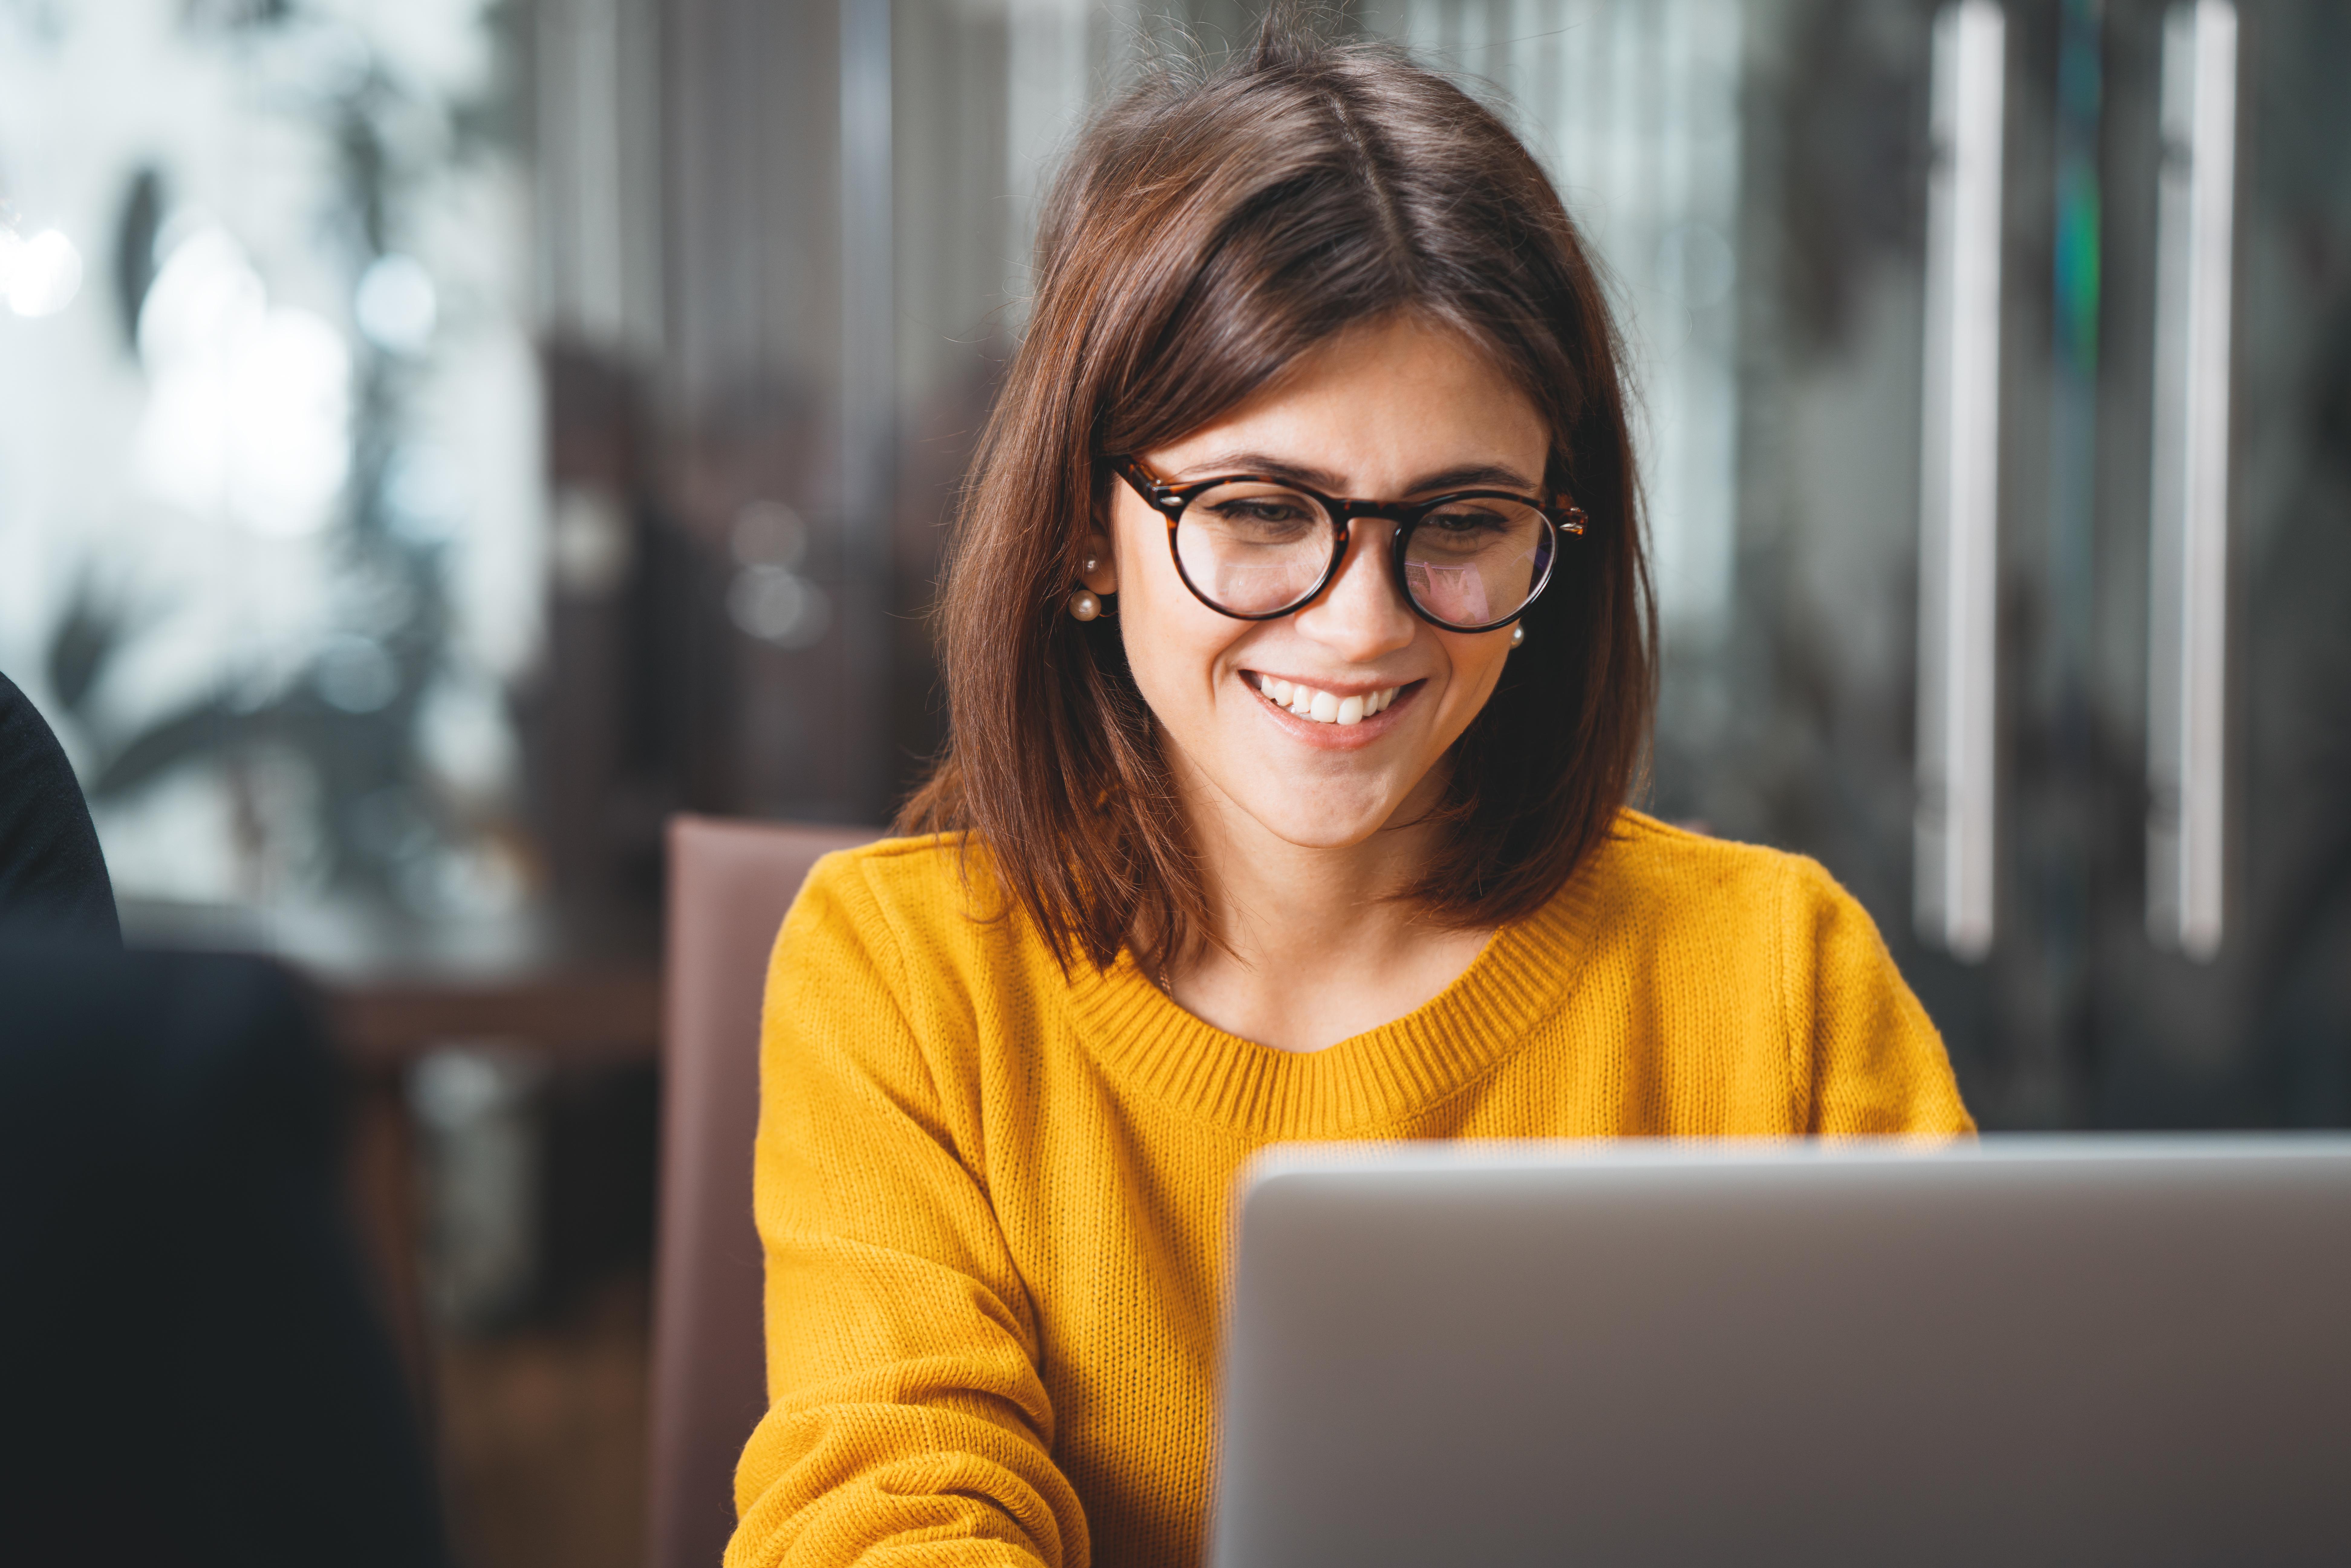 woman-using-computer